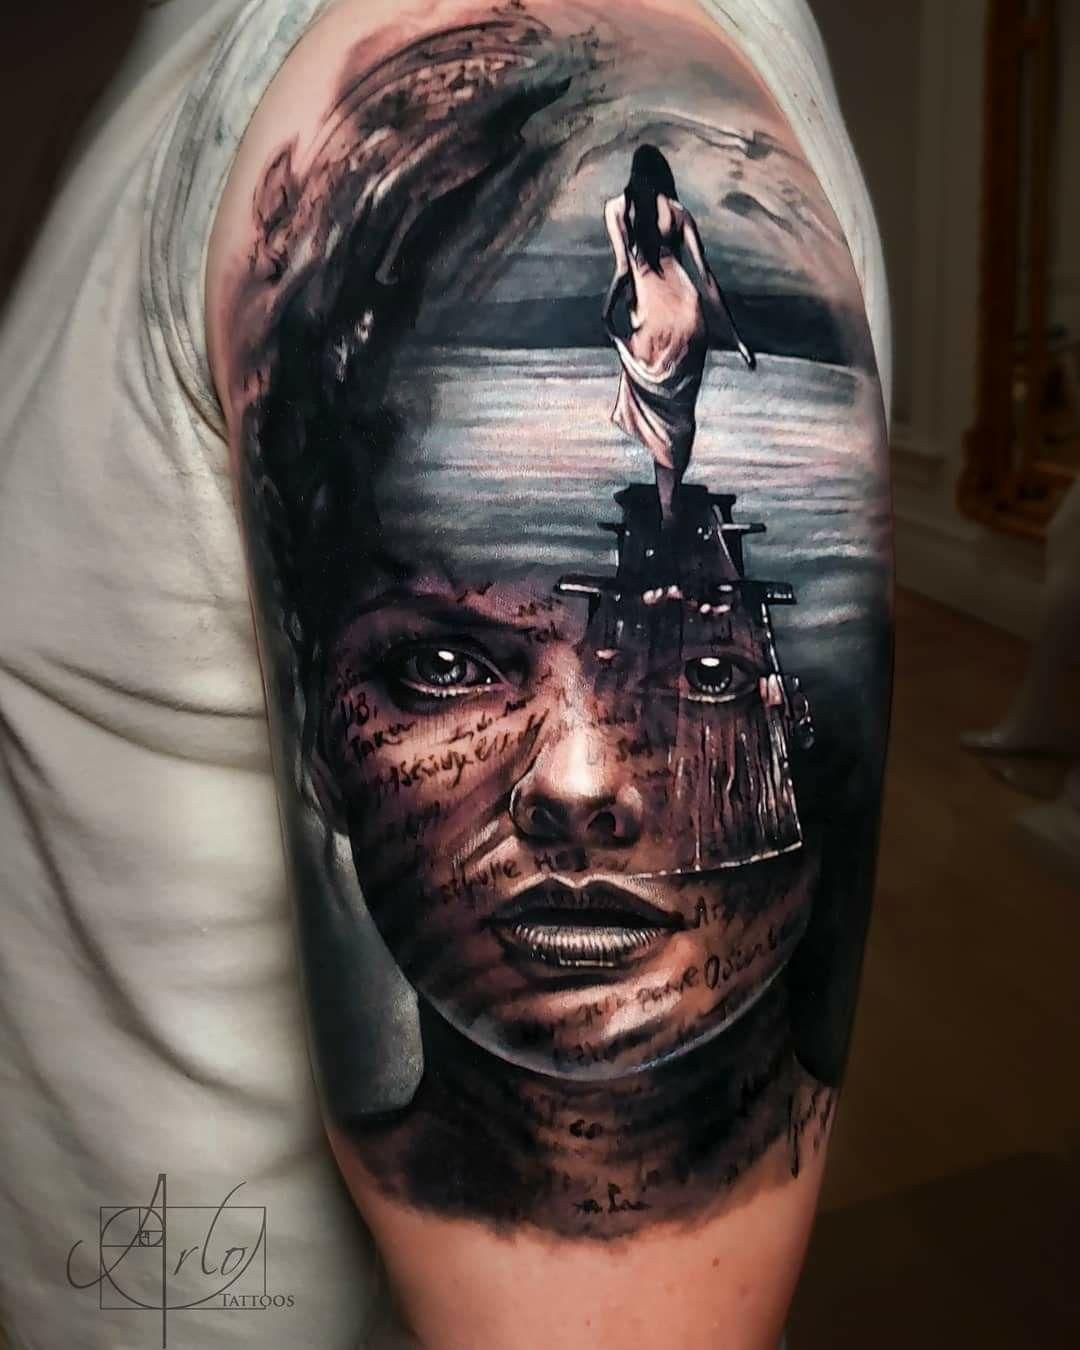 Arlo Di Cristina Arm Tattoo: Lake Tattoo, Surreal Tattoo, Tattoos